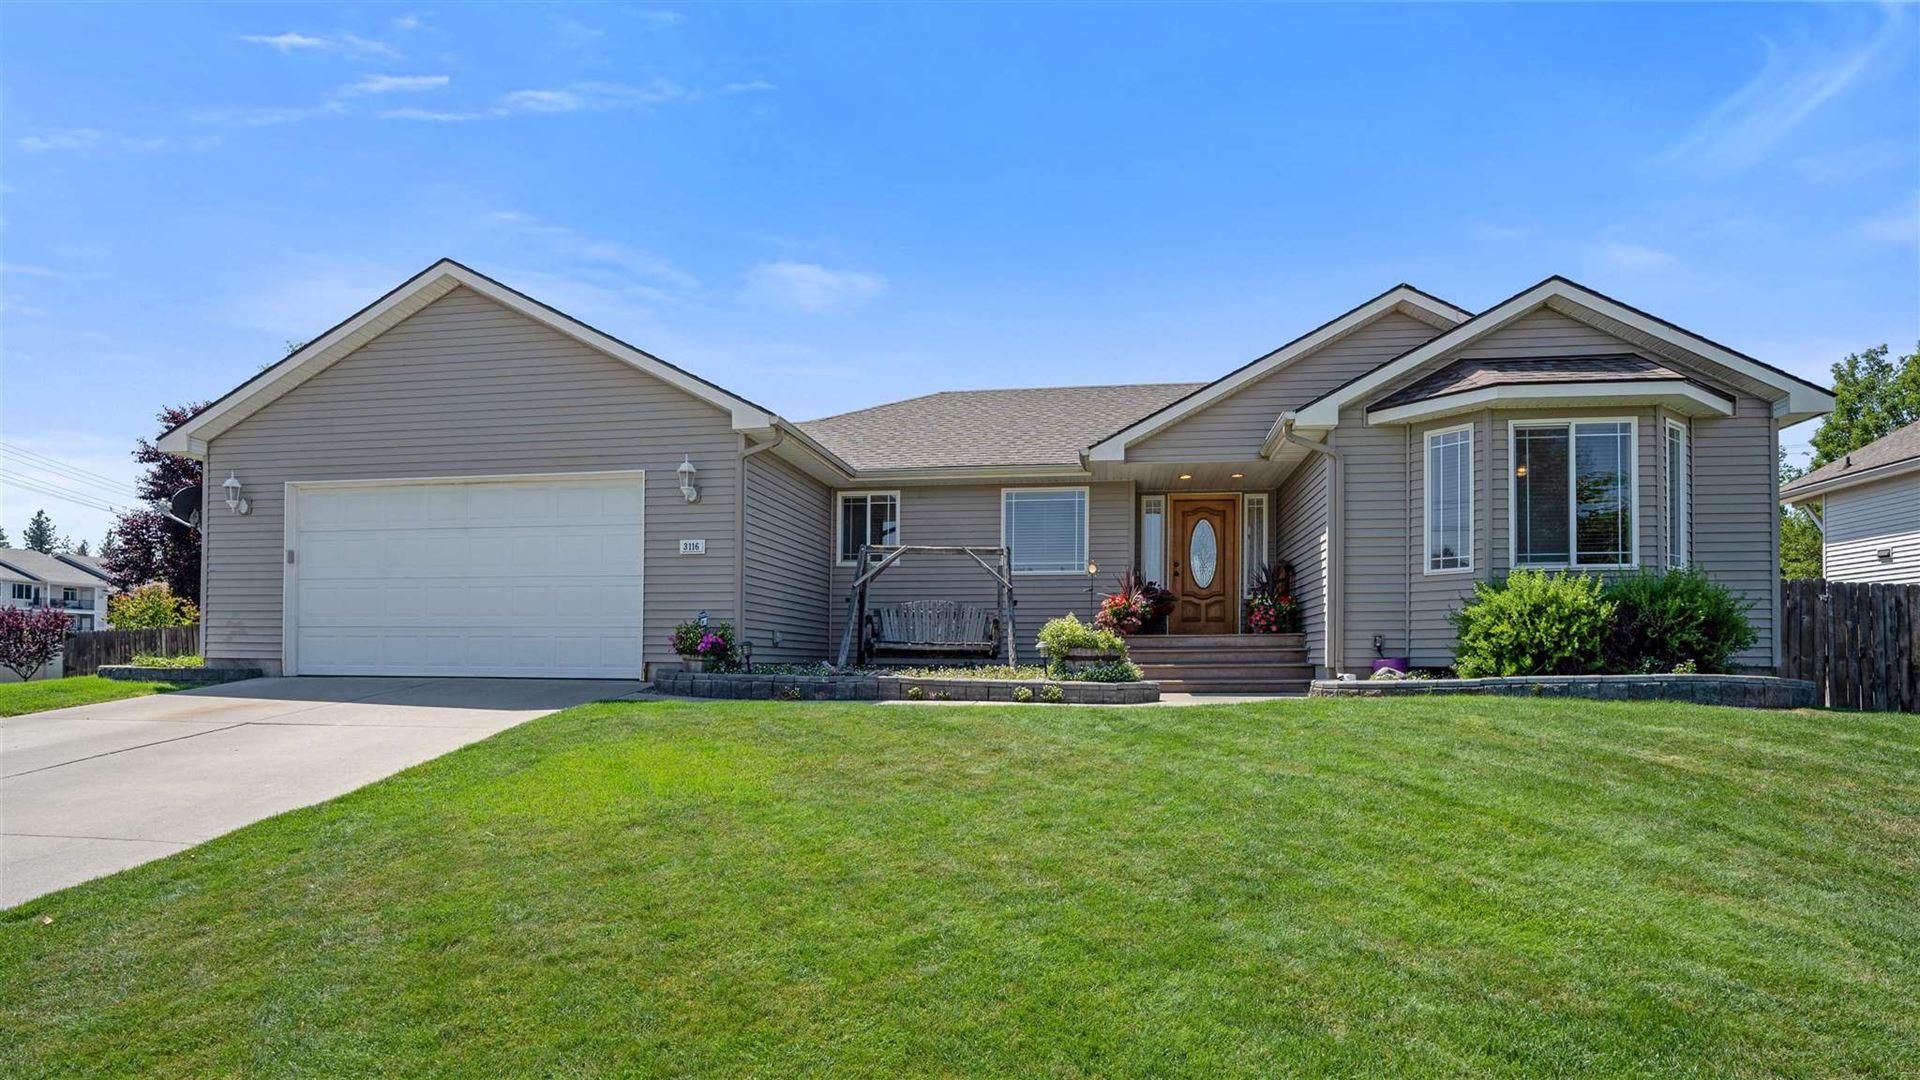 3116 S Bolivar Ct, Spokane Valley, WA 99037 - #: 202118459